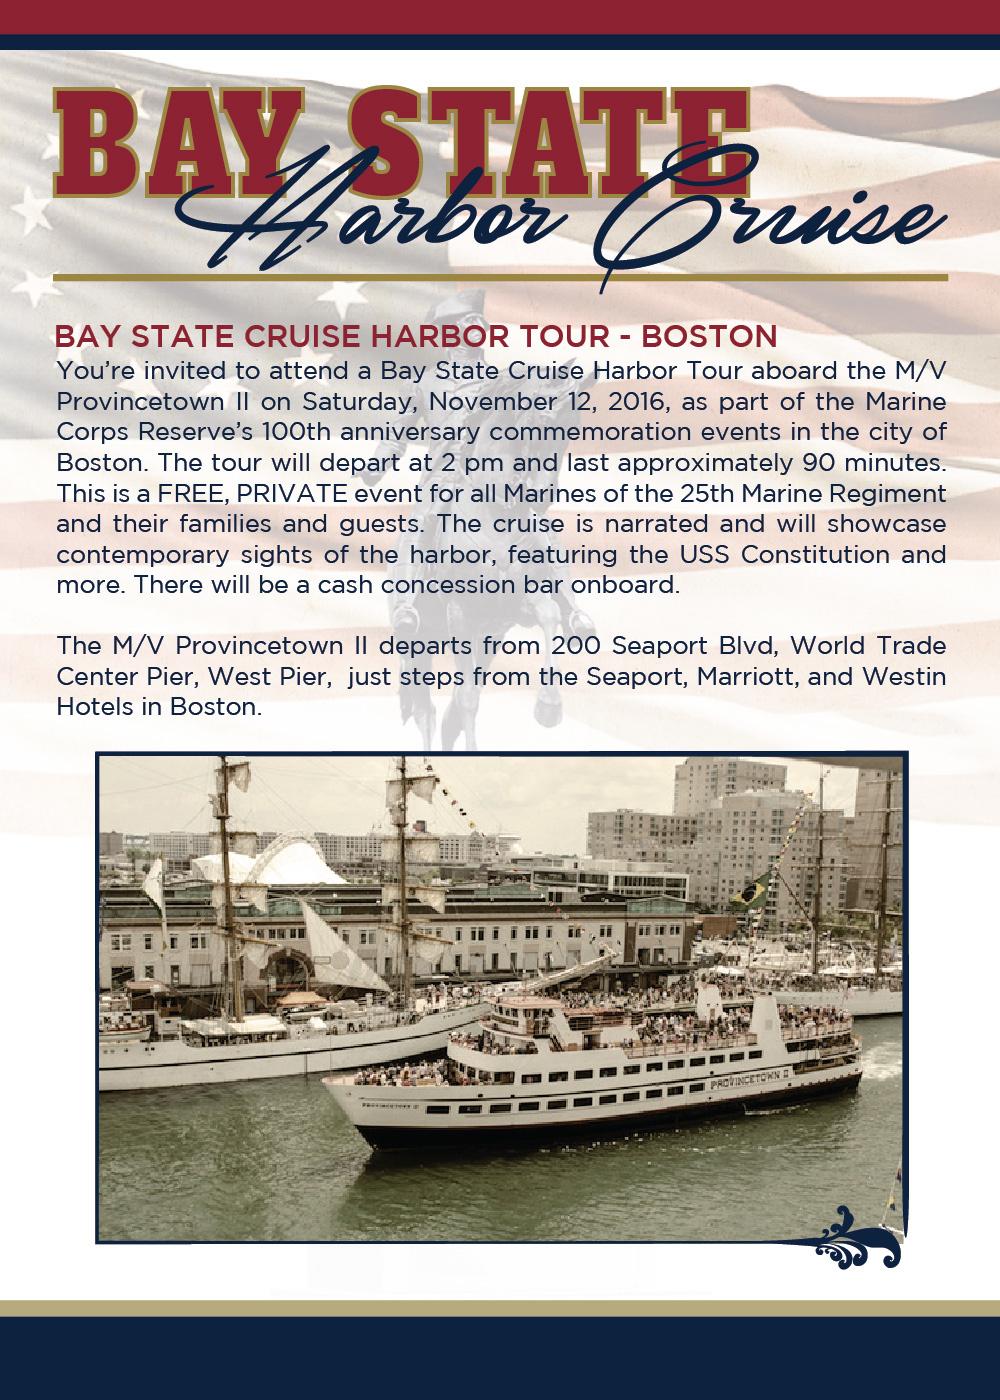 Marine Corps Reserve Centennial - Boston Harbor Cruise Hand Bill